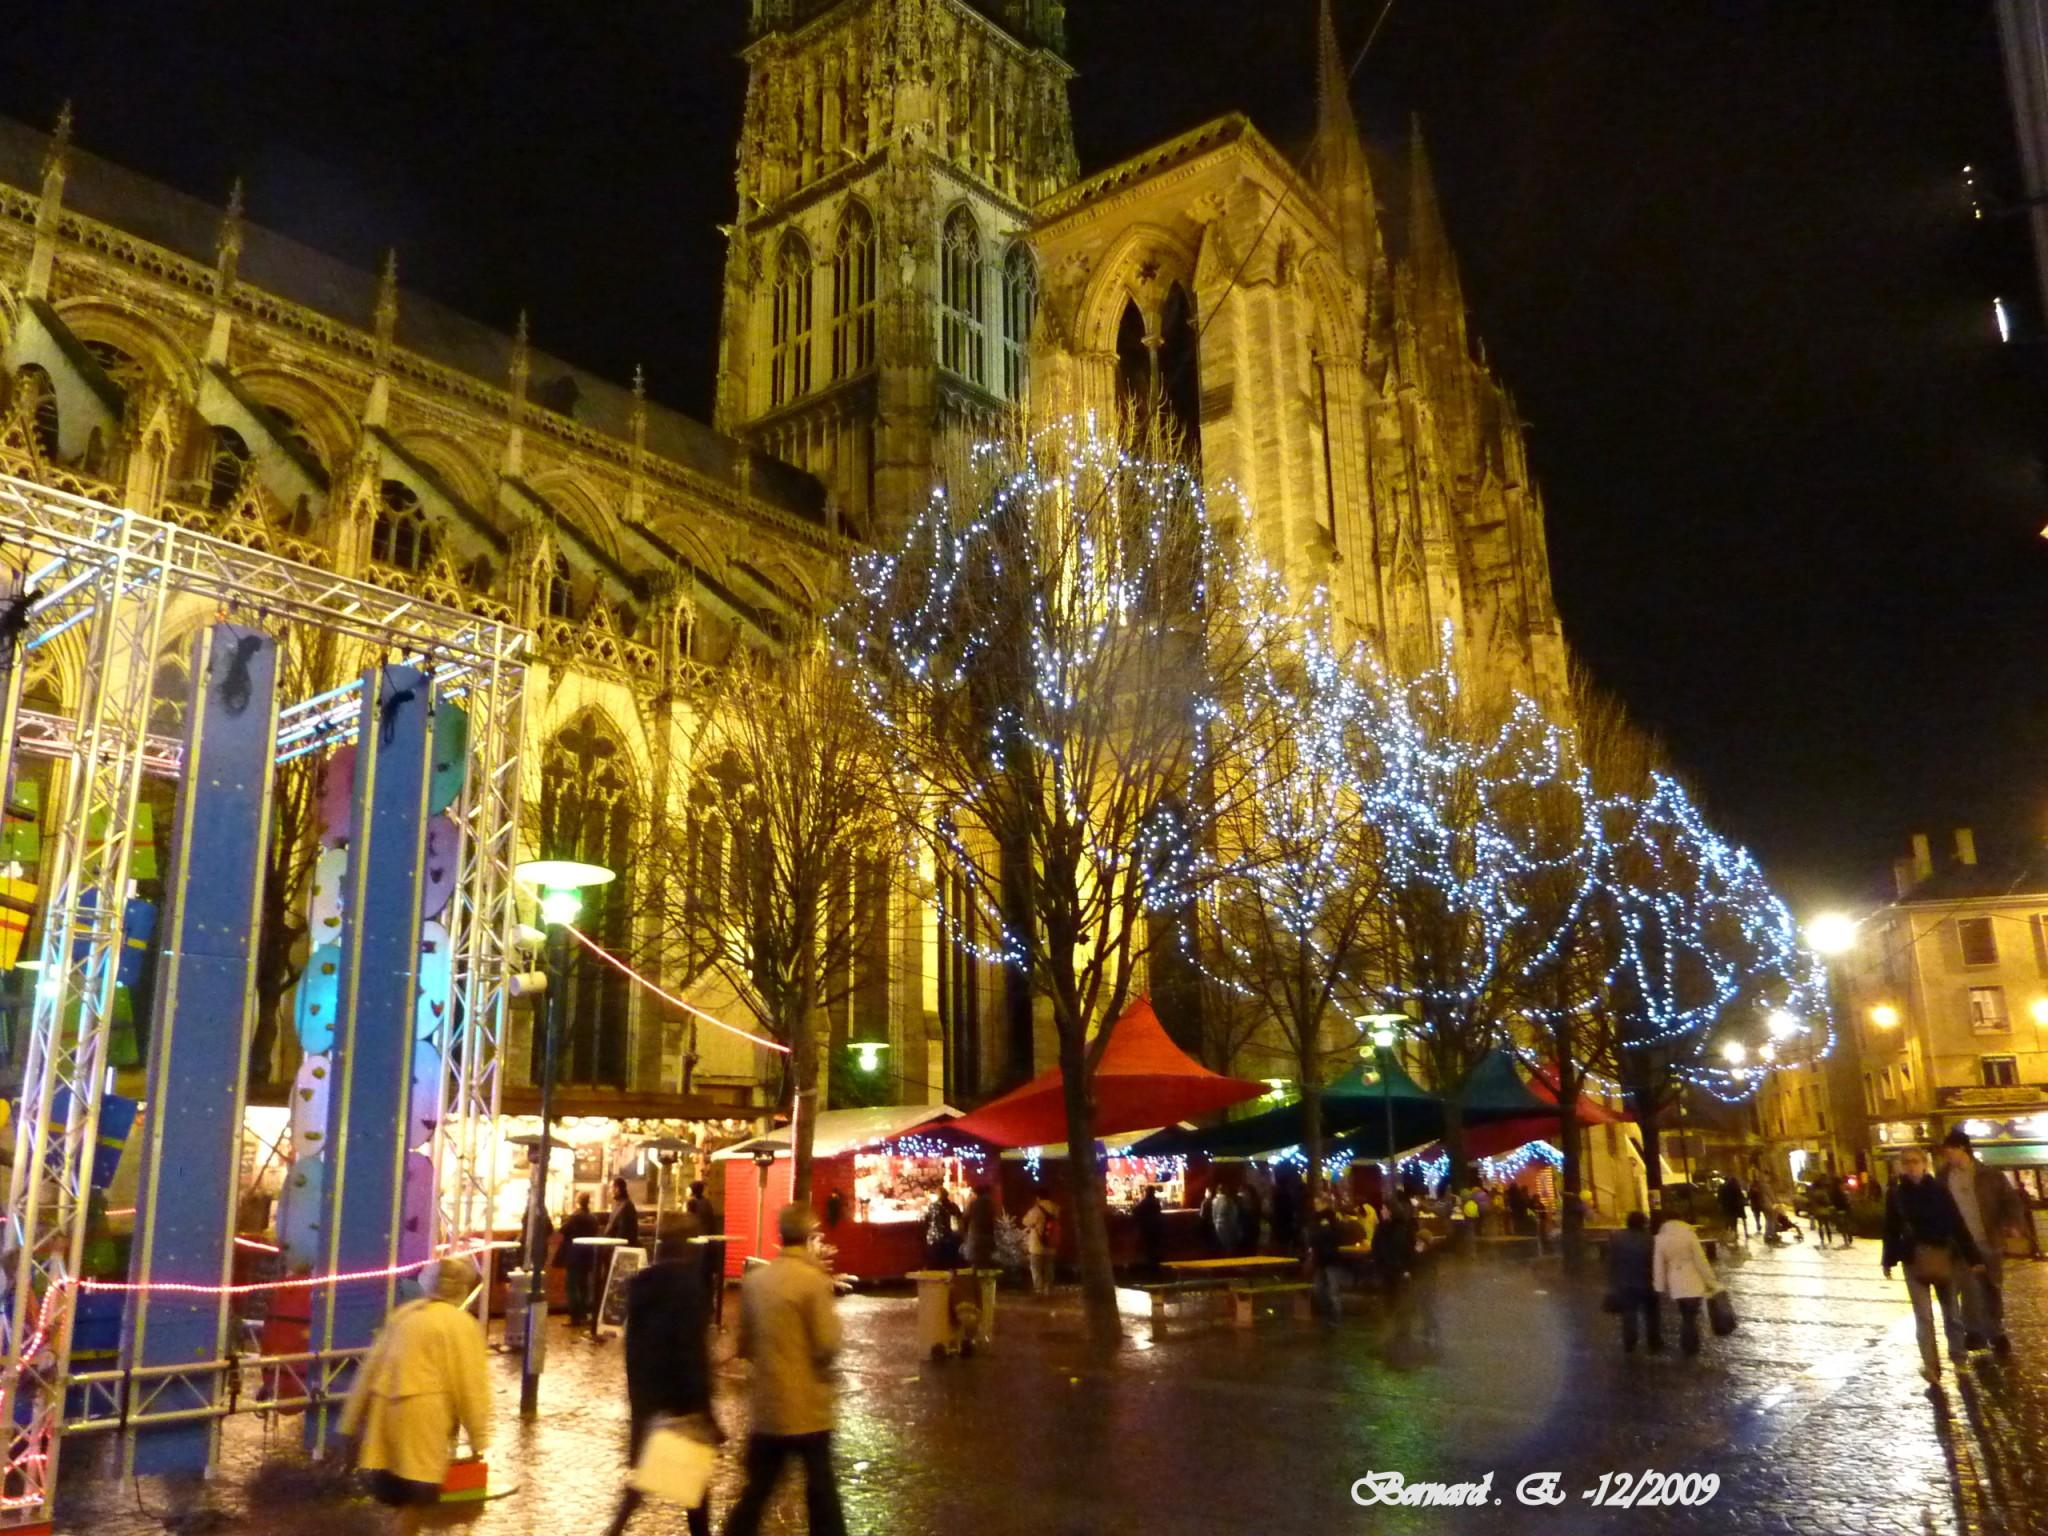 noel 2018 rouen Rouen Christmas Market   French Moments noel 2018 rouen